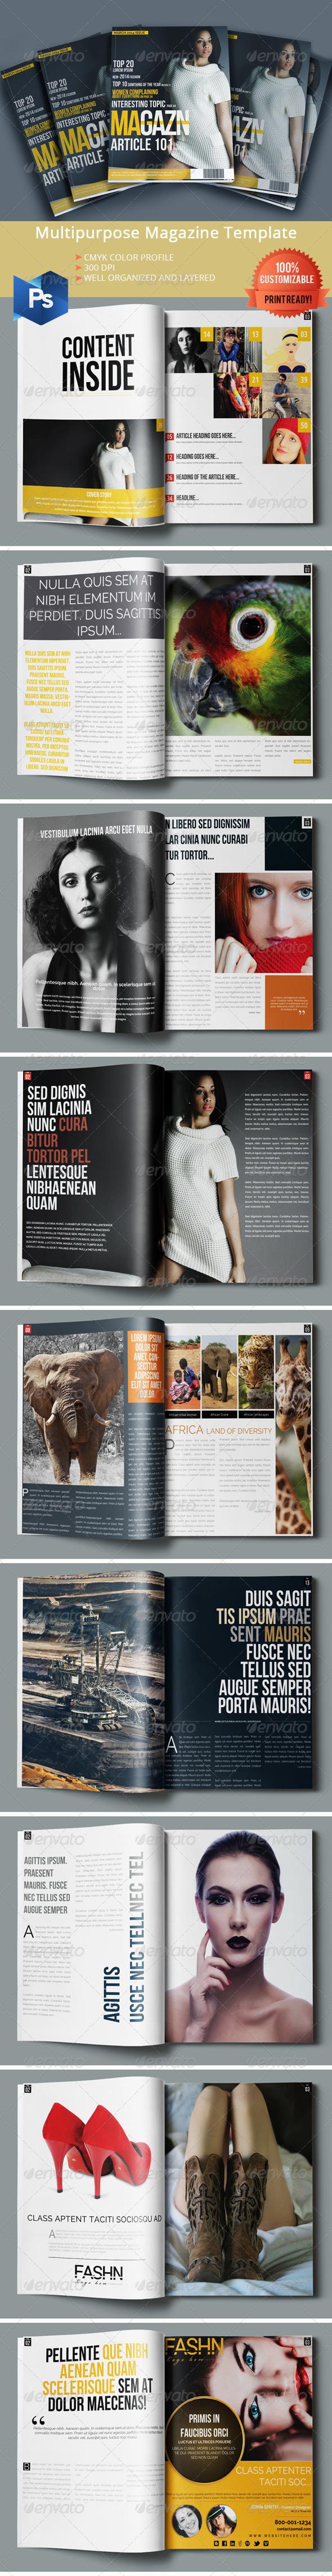 Multipurpose Magazine Template - Photoshop PSD - Magazines Print Templates